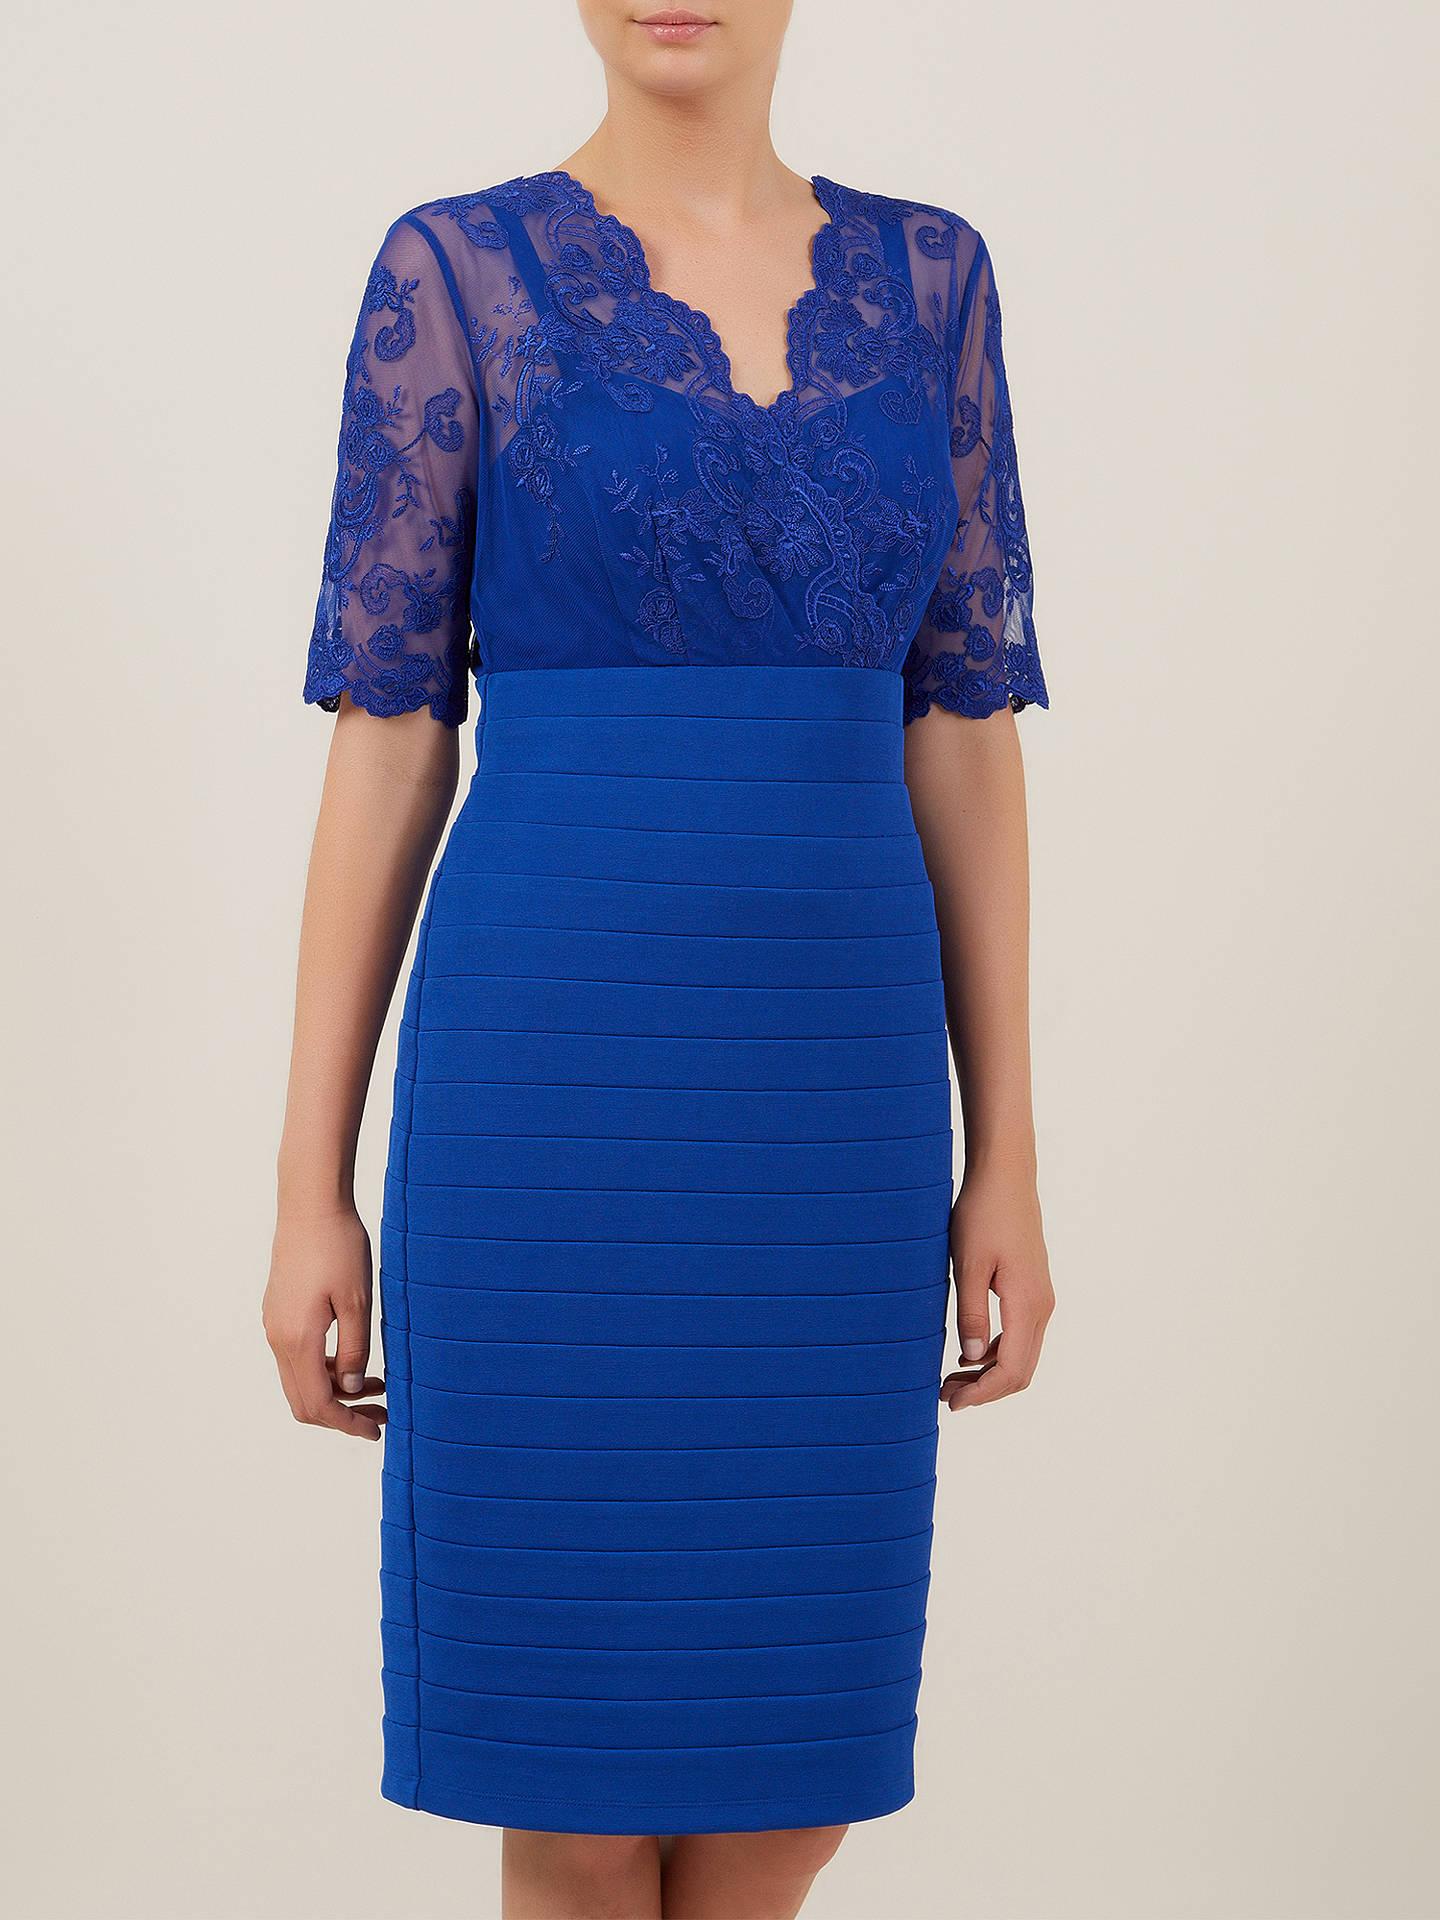 e1d42aca13b ... Buy Kaliko Lace and Jersey Dress, Colbalt, 10 Online at johnlewis.com  ...